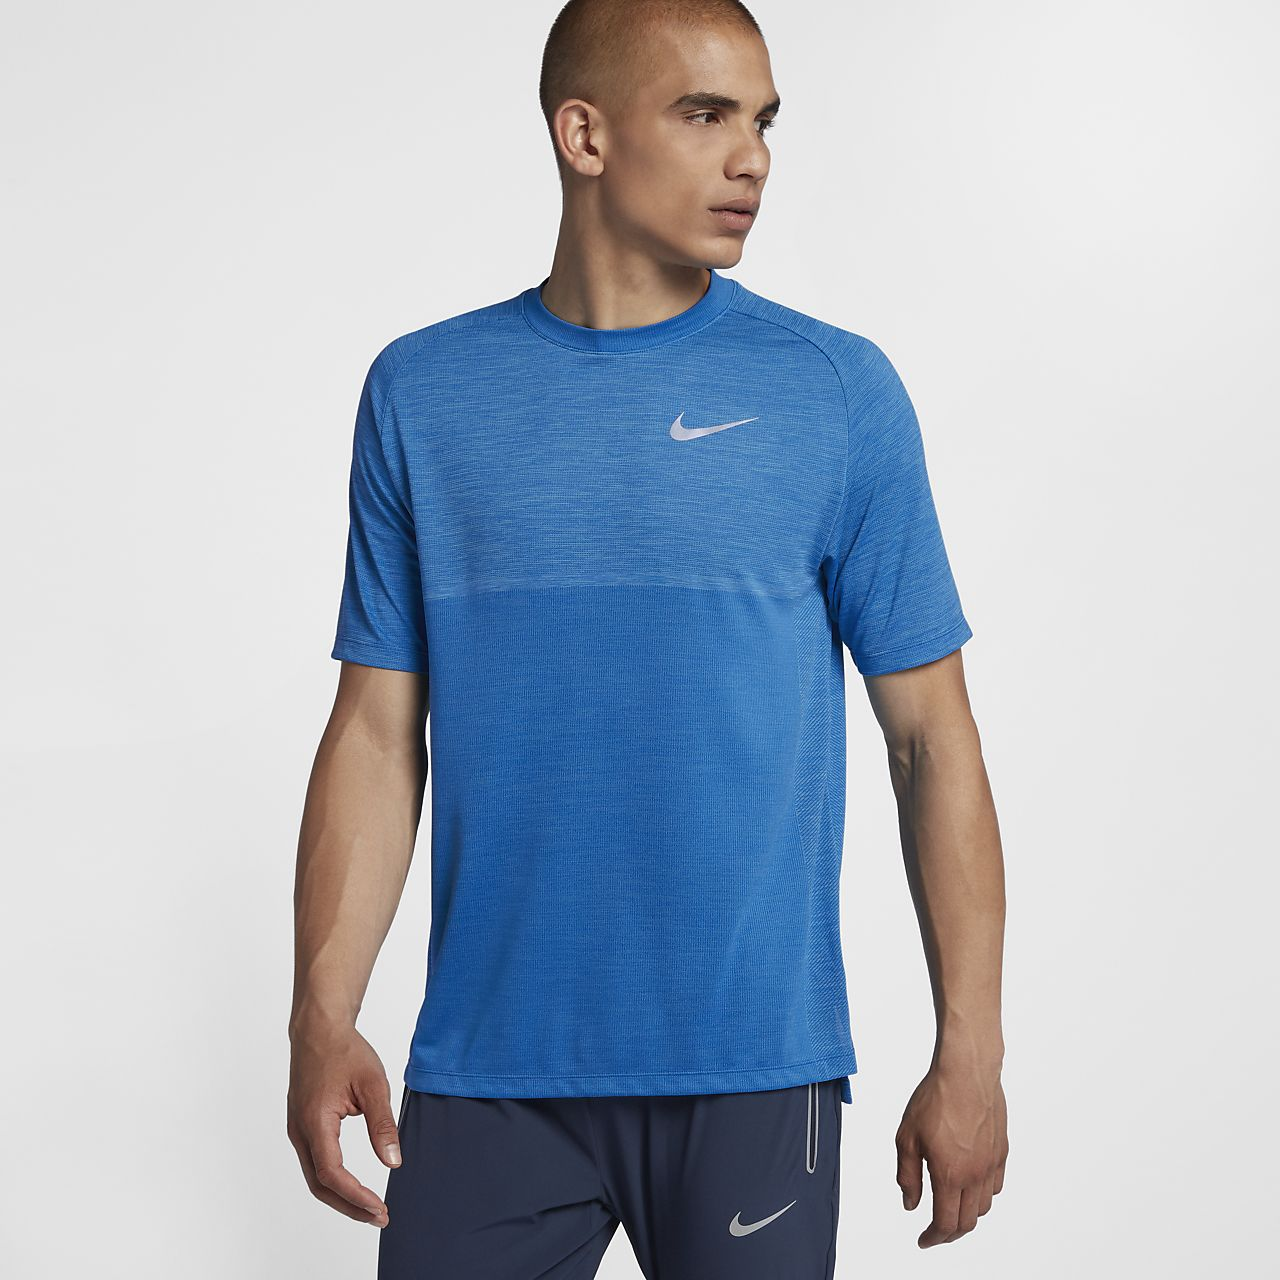 Camisola de running de manga curta Nike Dri-FIT Medalist para homem